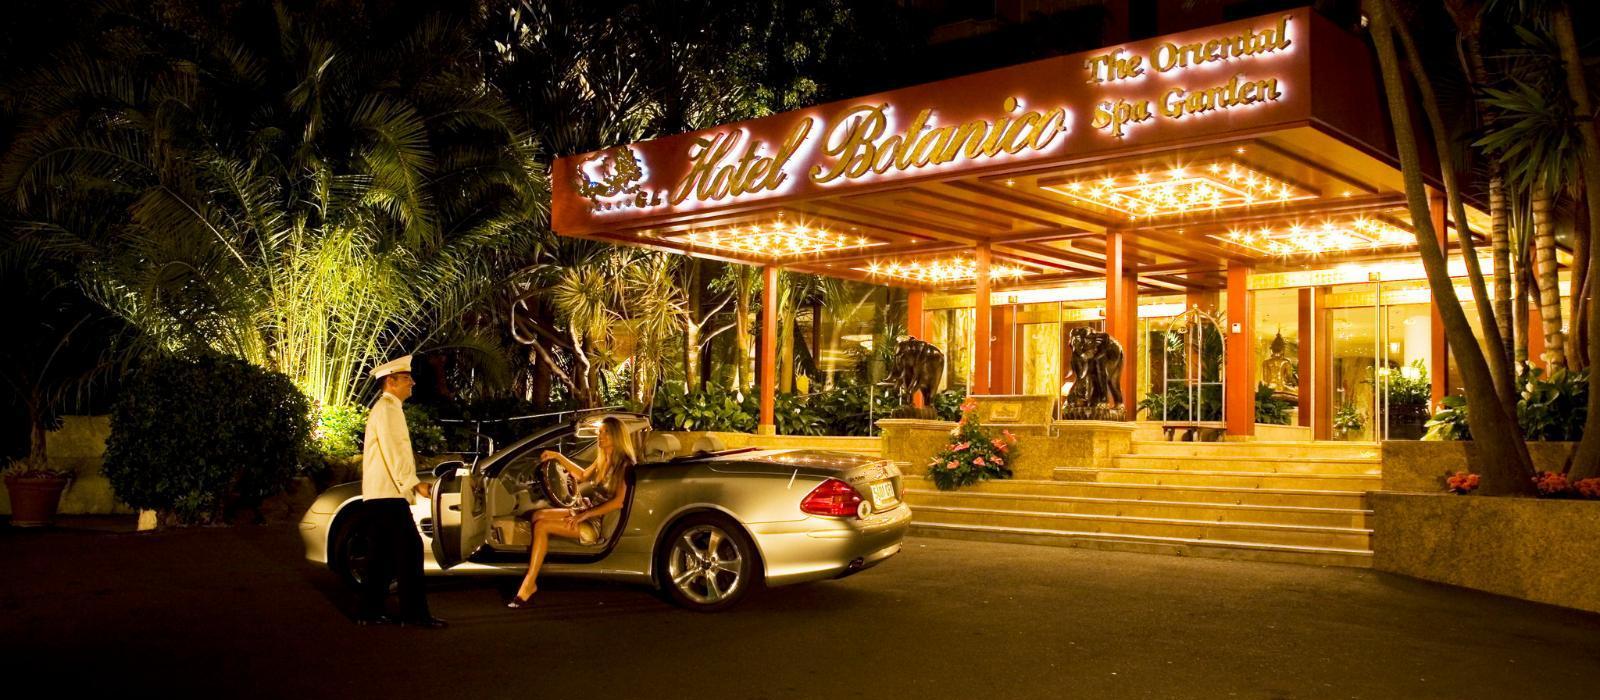 东方植物园水疗花园酒店(Hotel Botanico & The Oriental Spa Garden) 图片  www.lhw.cn